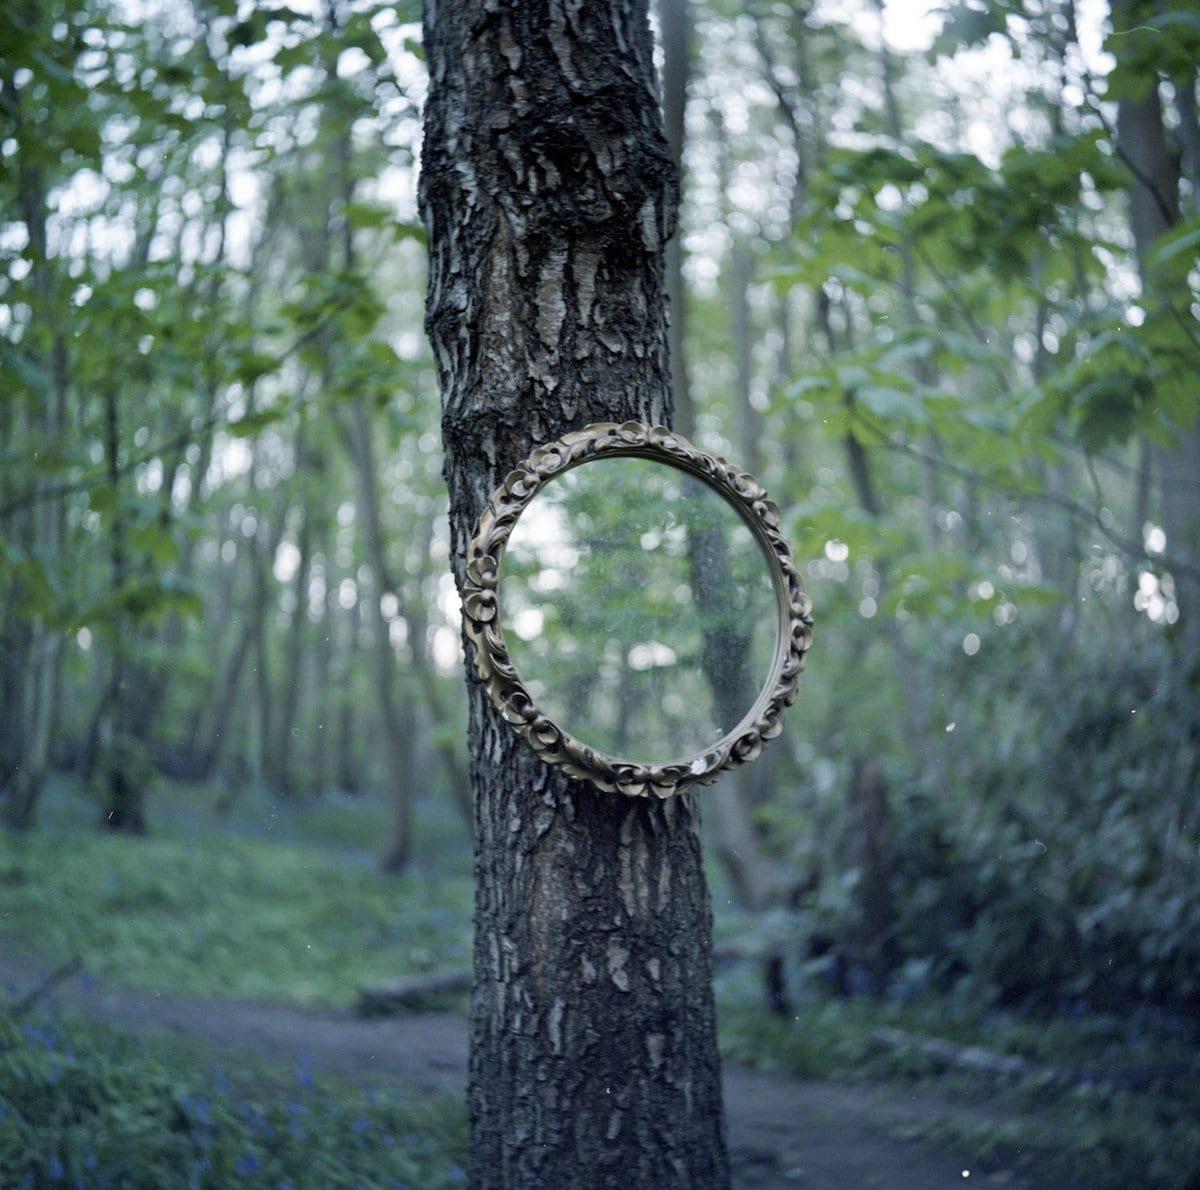 daniella-zalcman-female-in-focus-01